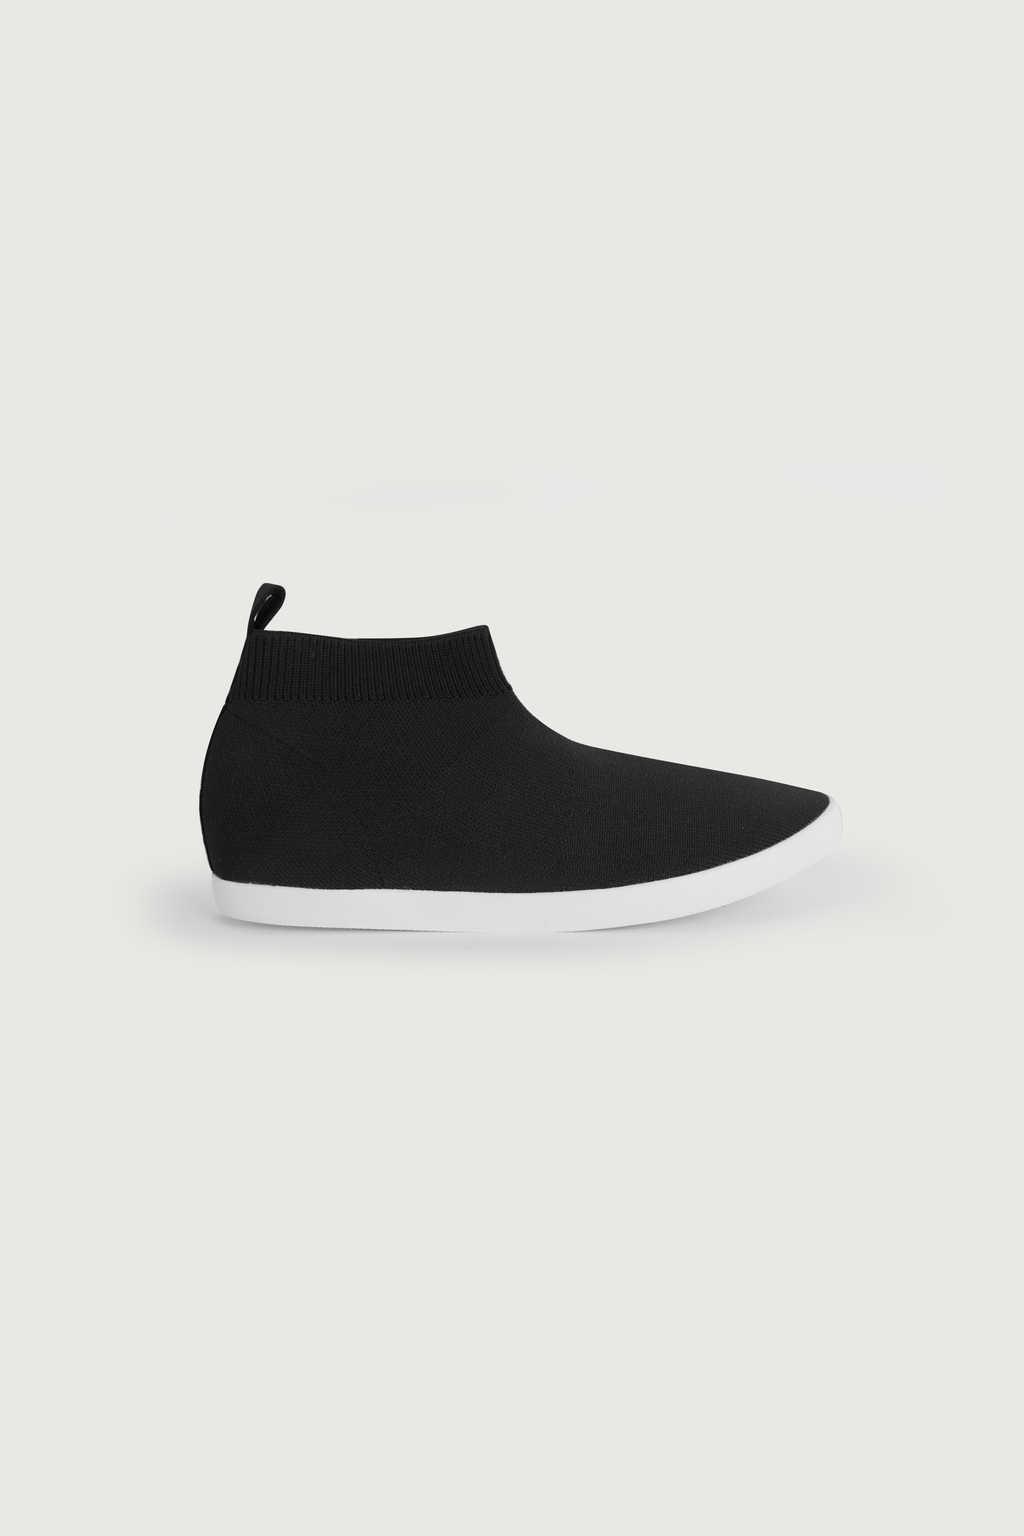 Sneaker 3334 Black 12